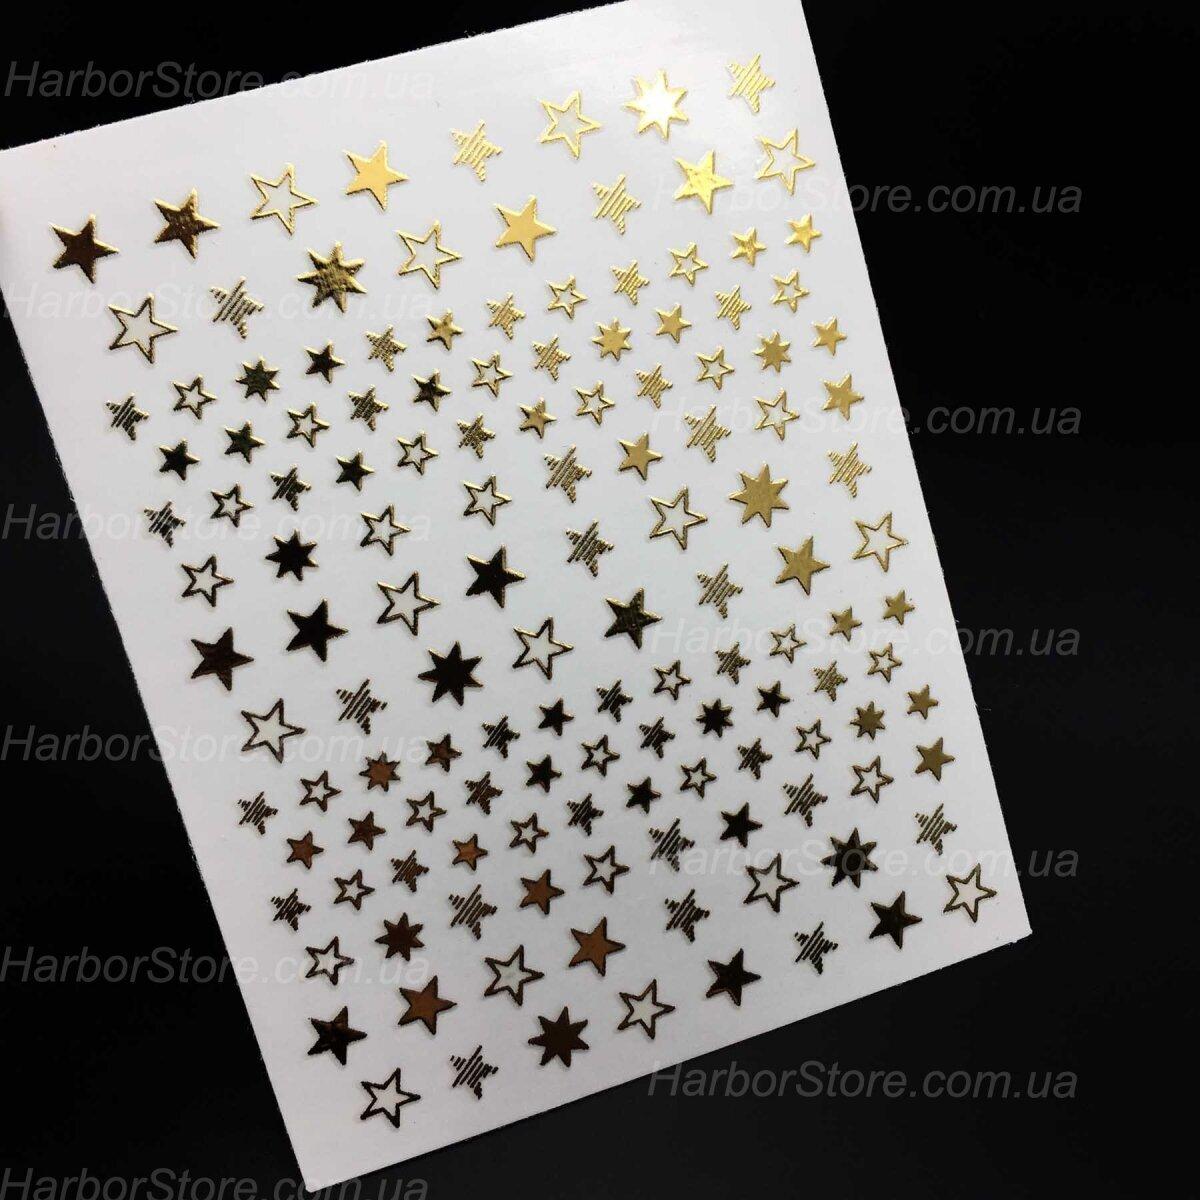 Наклейки на клейкой основе звезды Gold